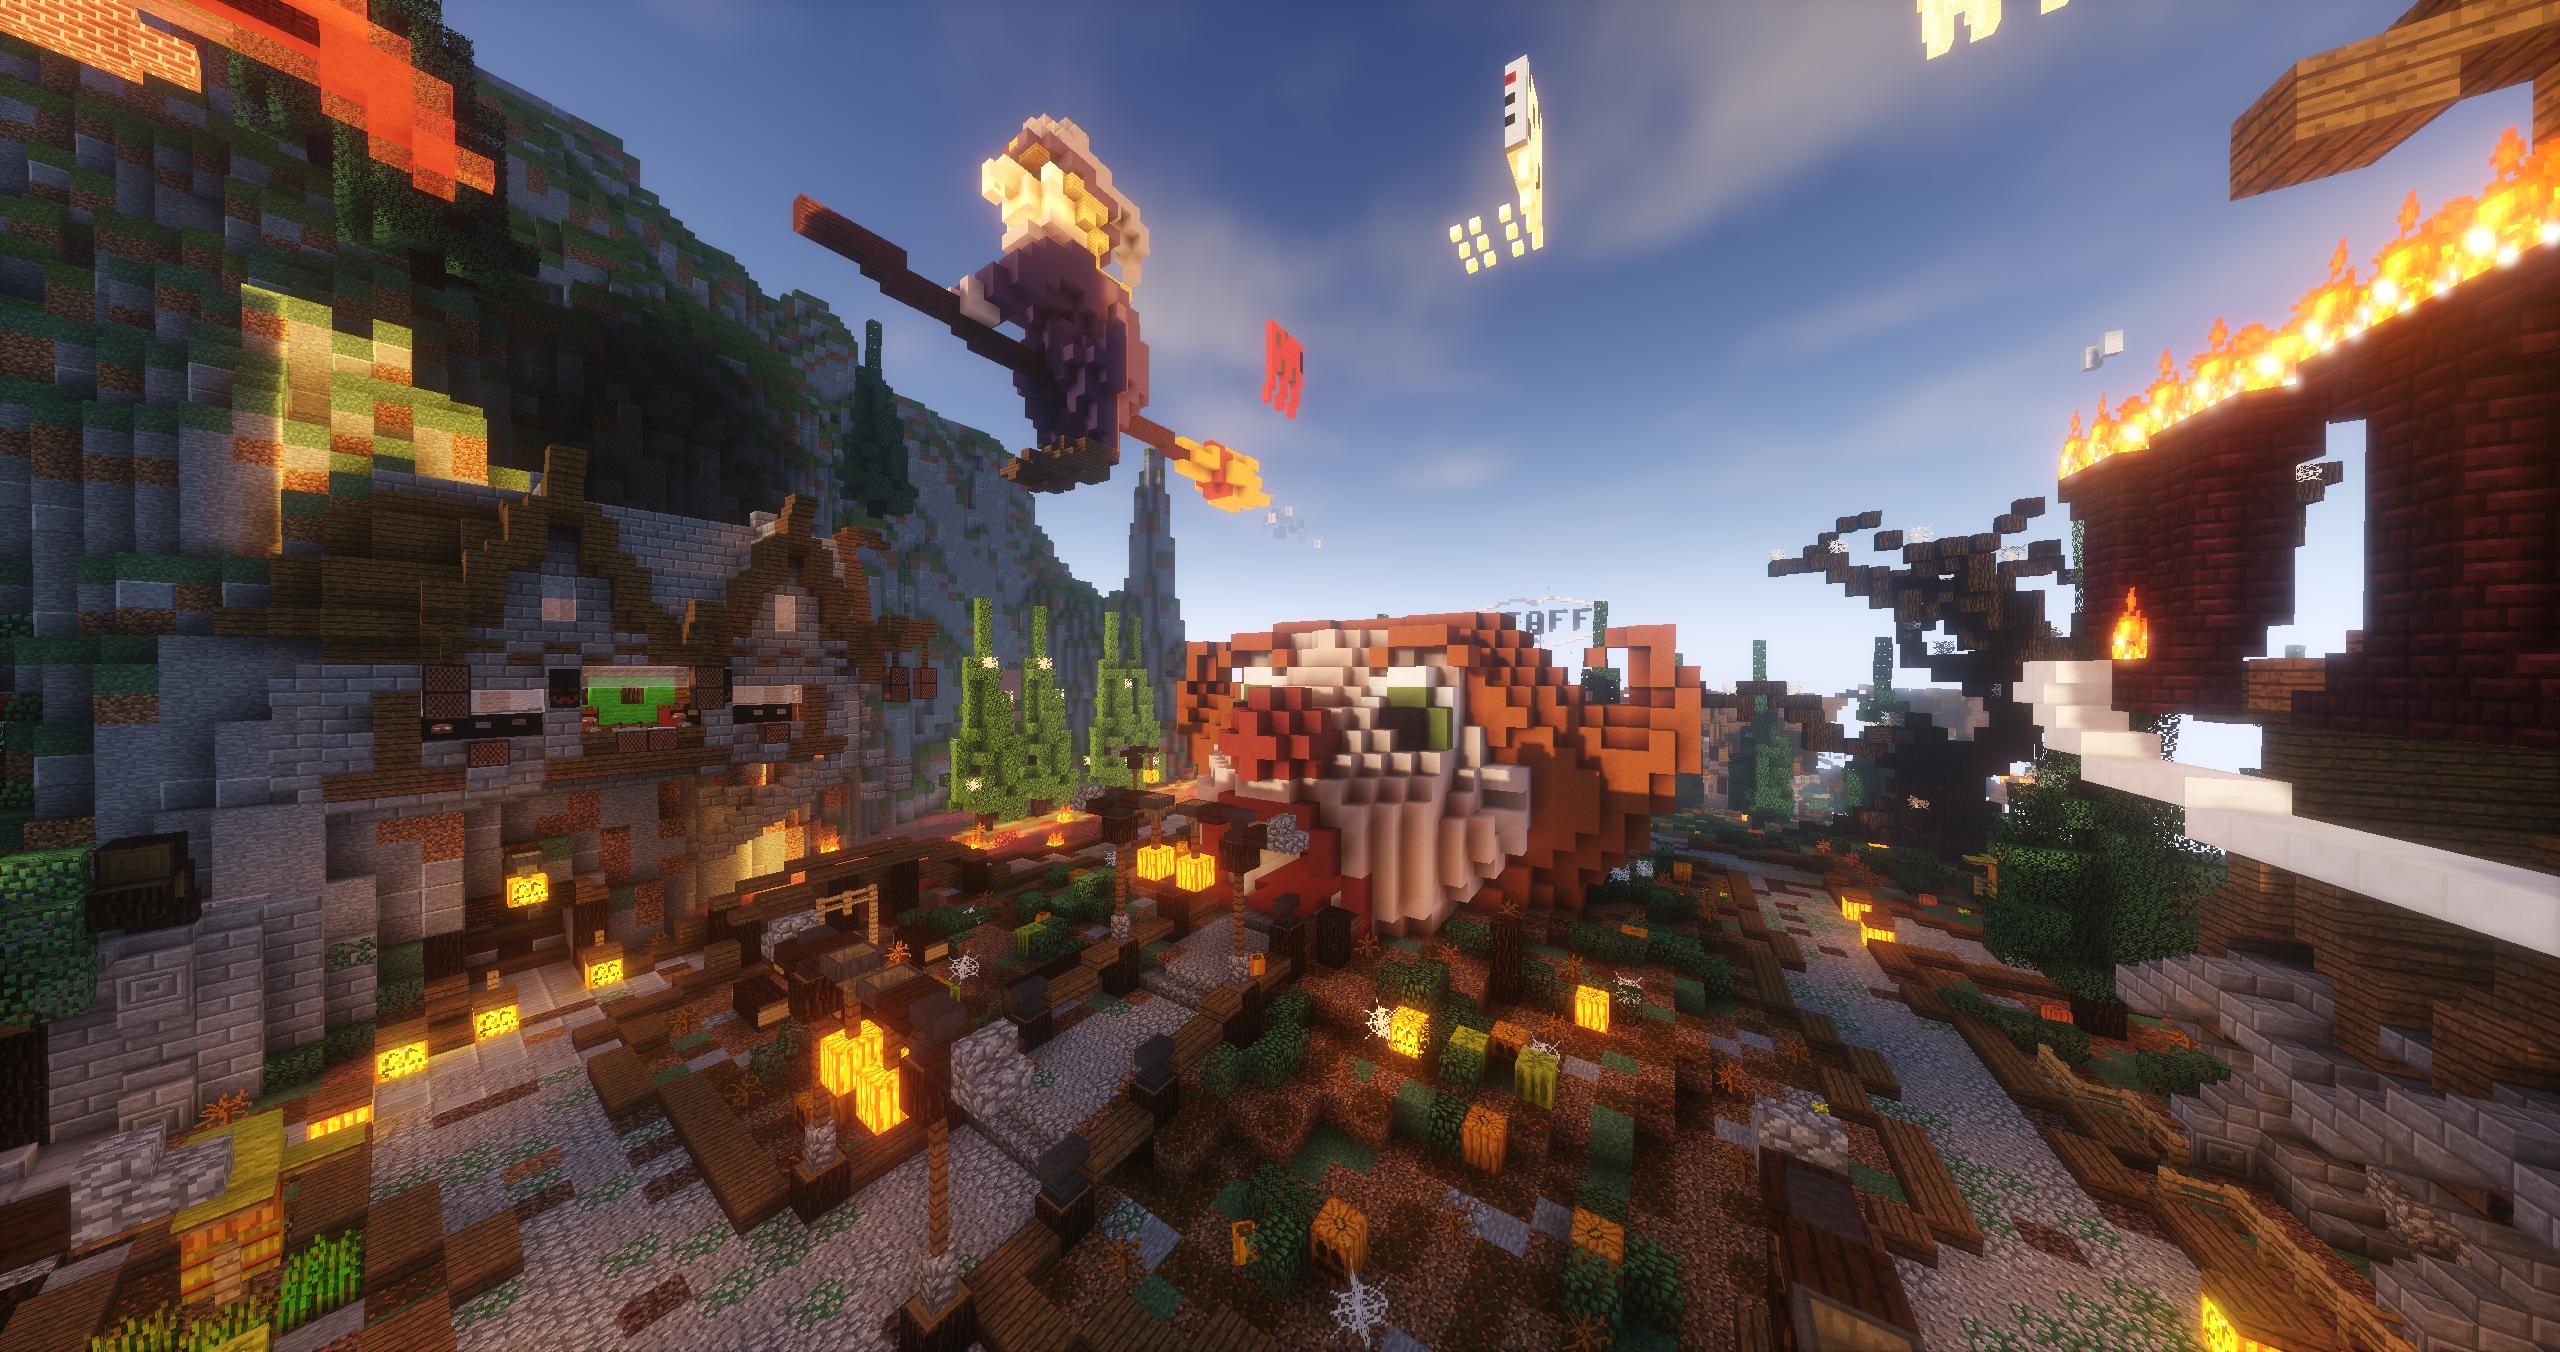 Minecraft Halloween Spawn Minecraft Clown Halloween Hub Lobby - Minecraft spiele lobby